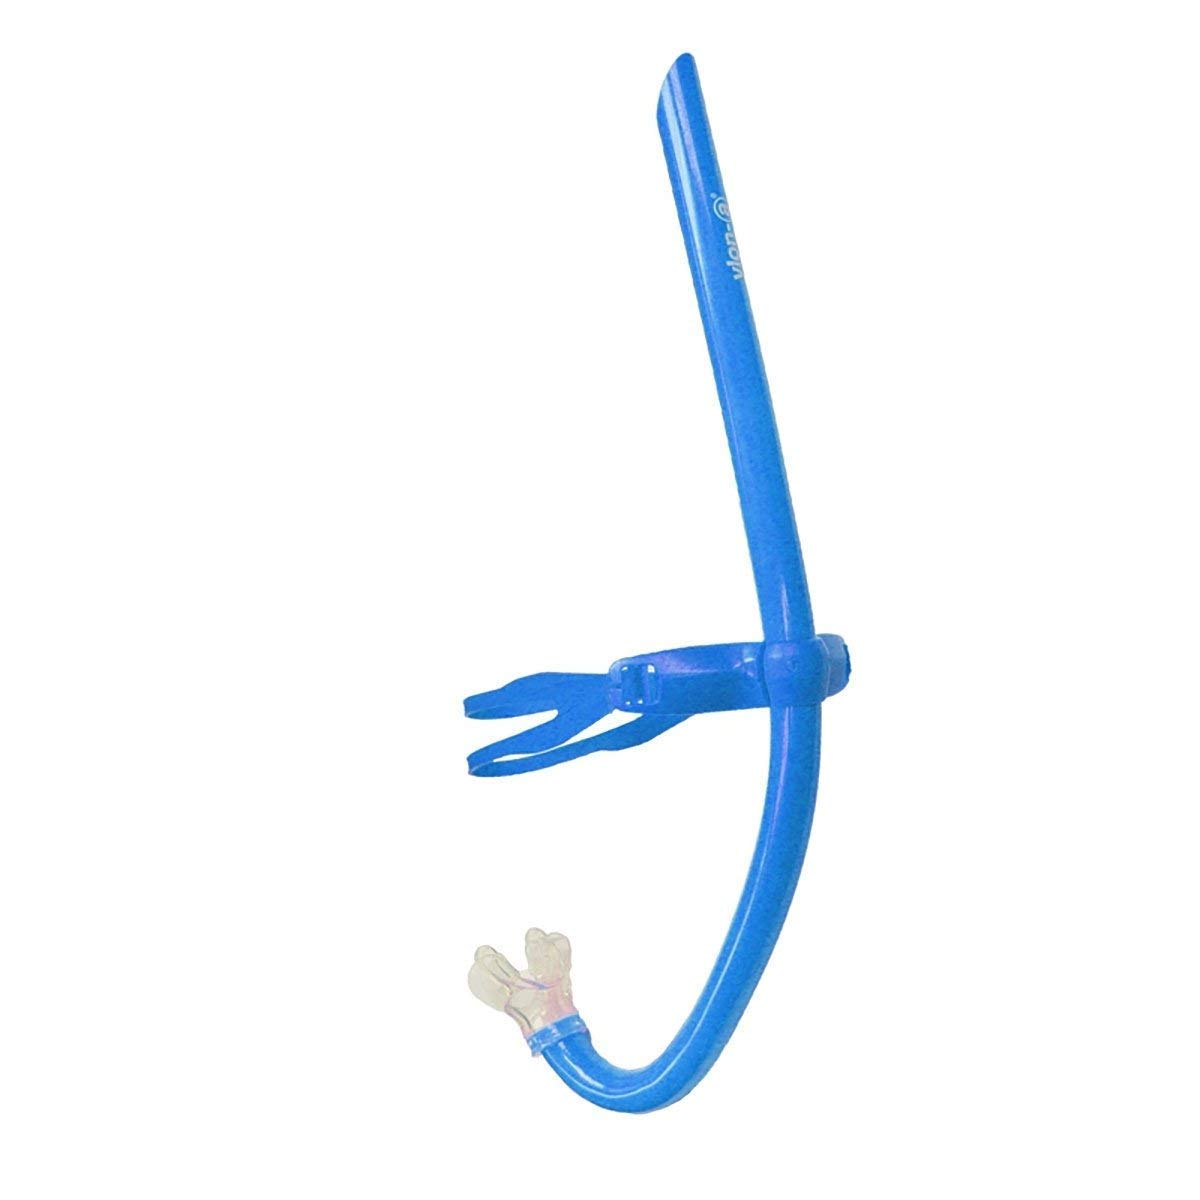 Ylon-a Swimmer's Snorkel Color: Royal